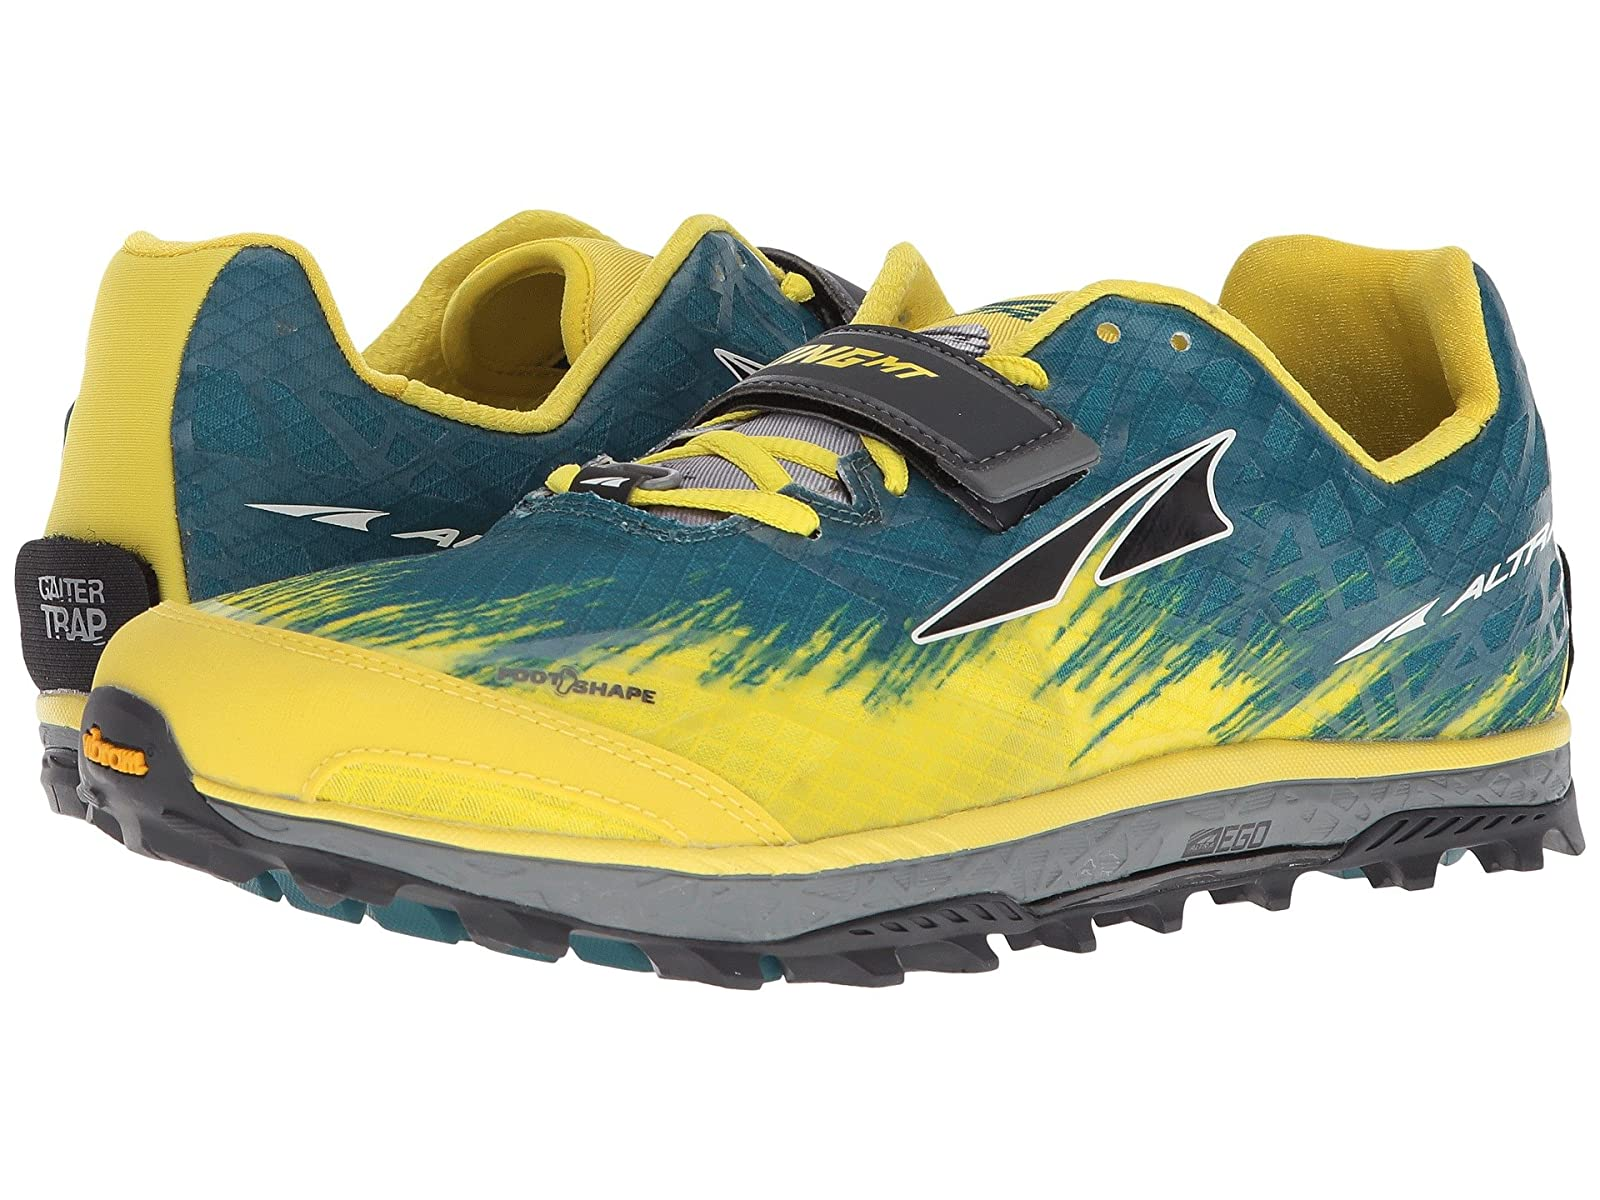 Altra Footwear King MT 1.5Atmospheric grades have affordable shoes